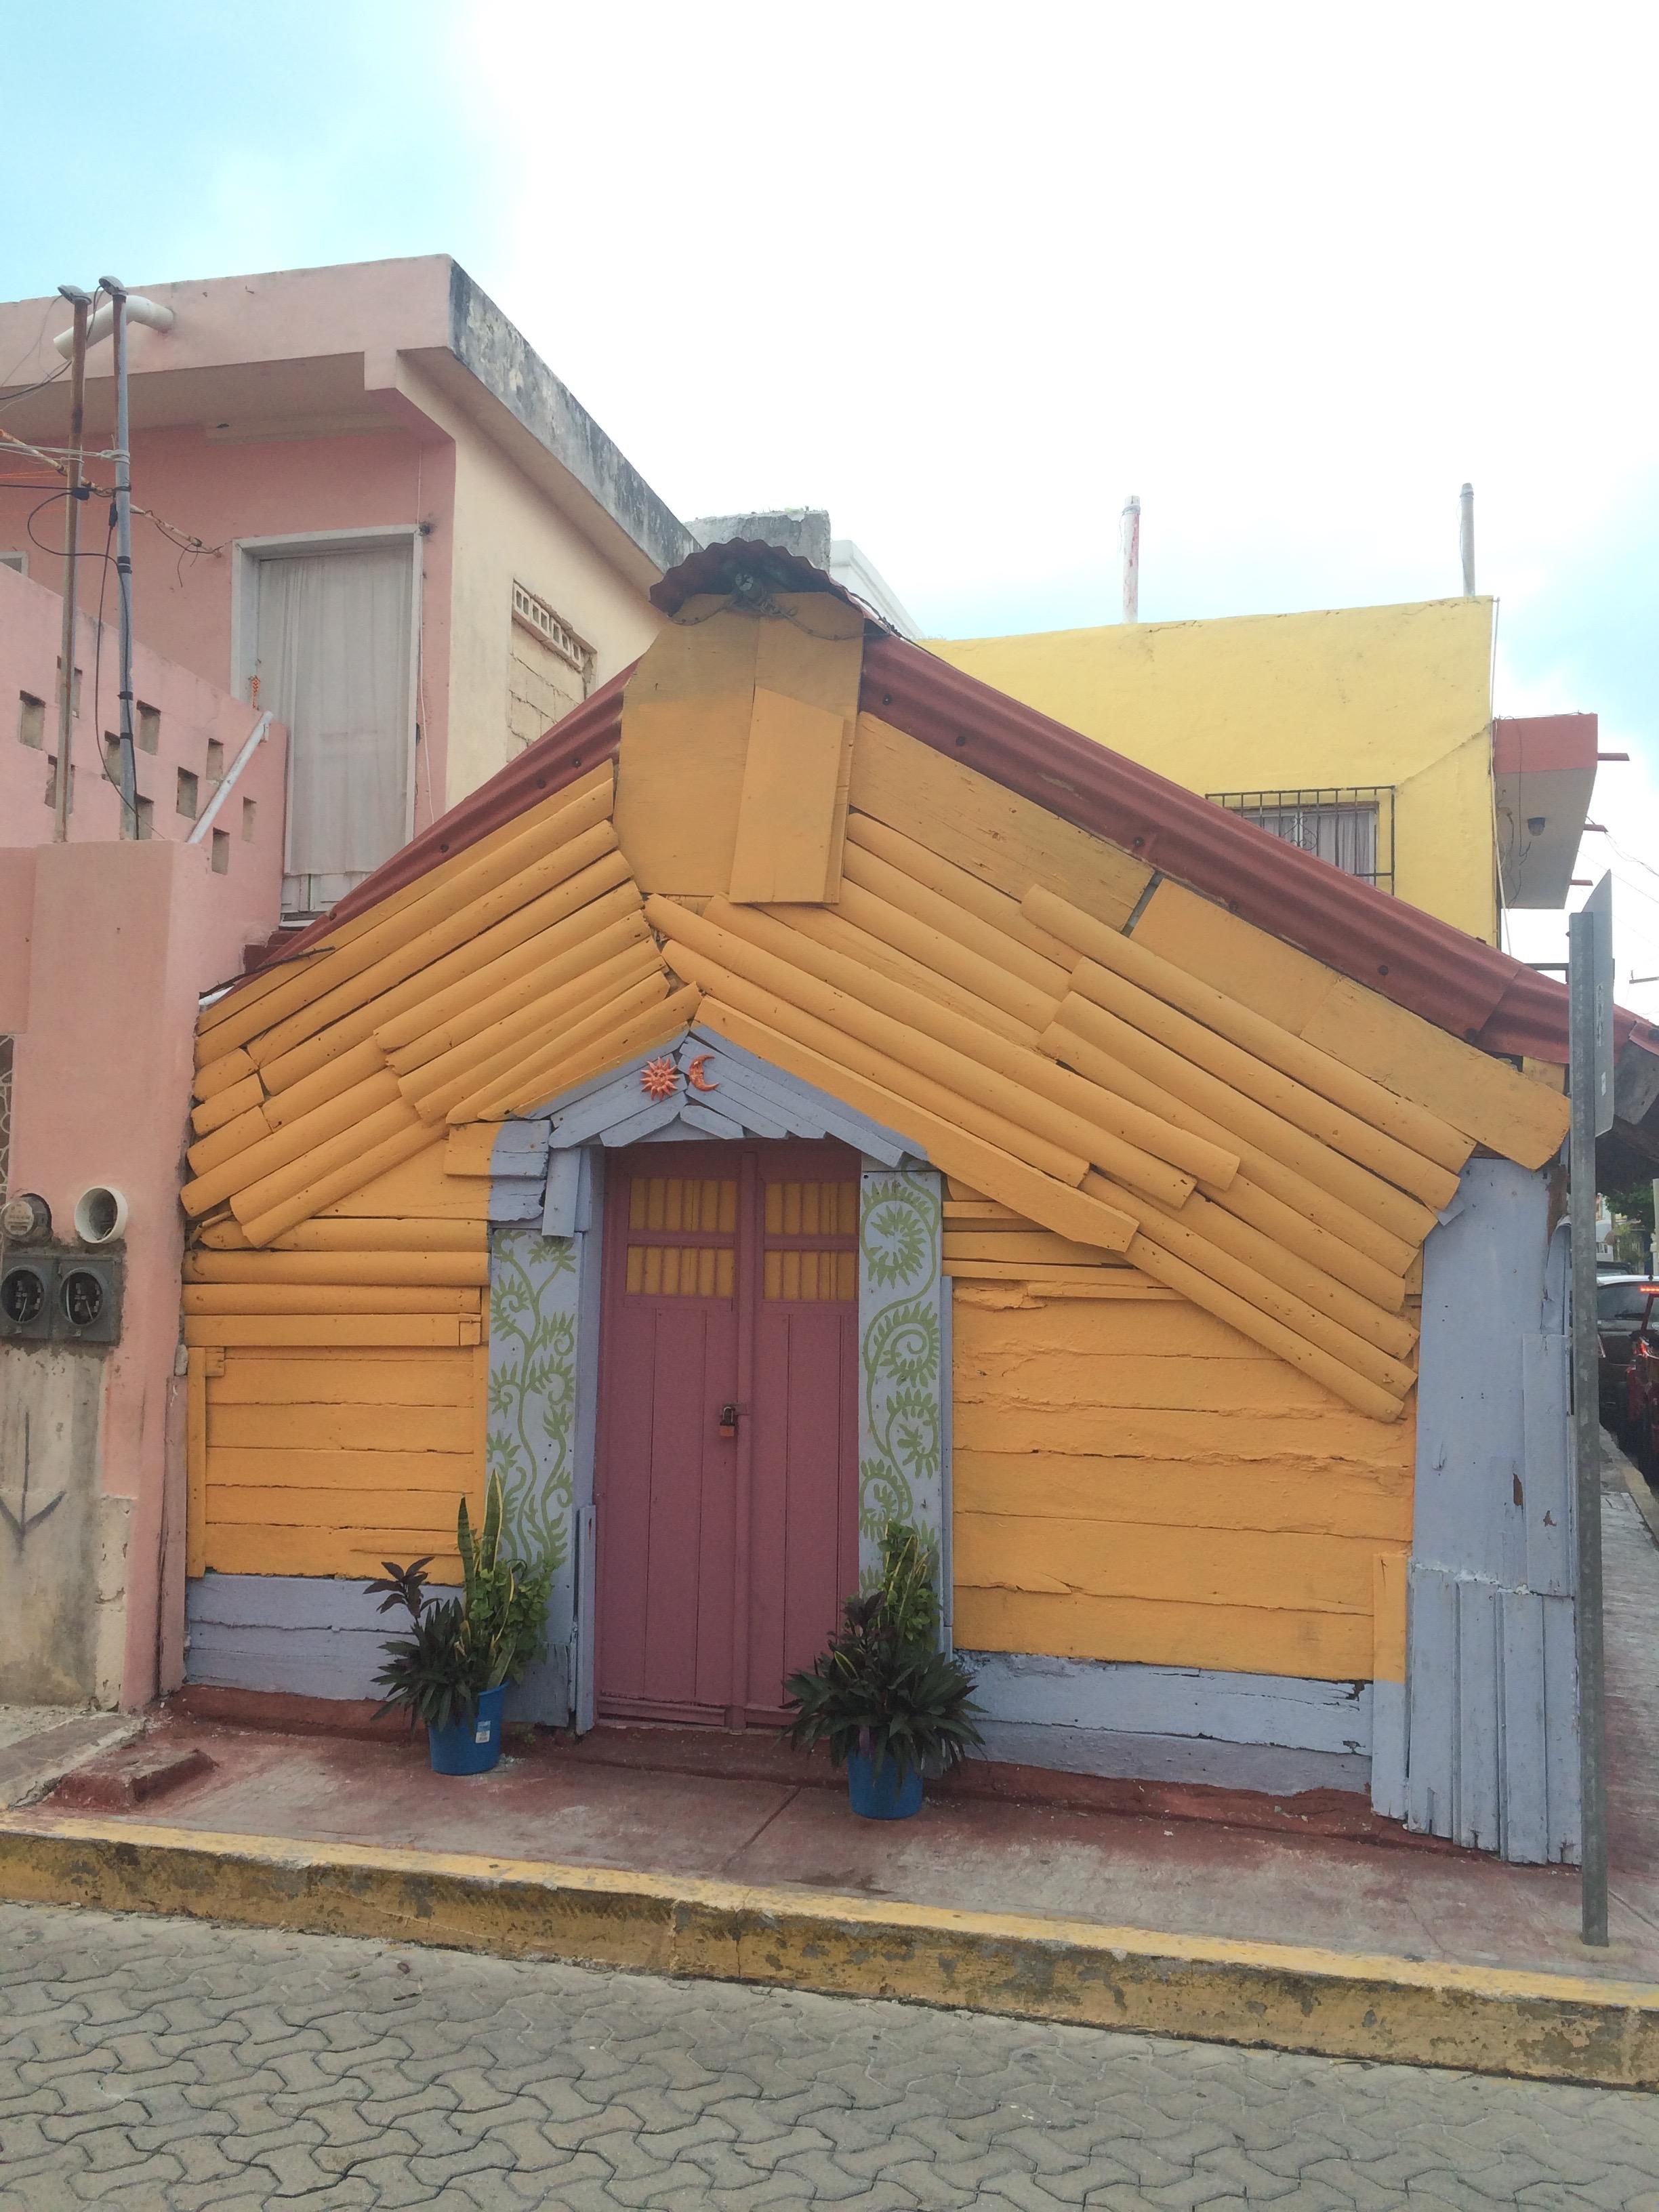 Cute house on Isla Mujeres